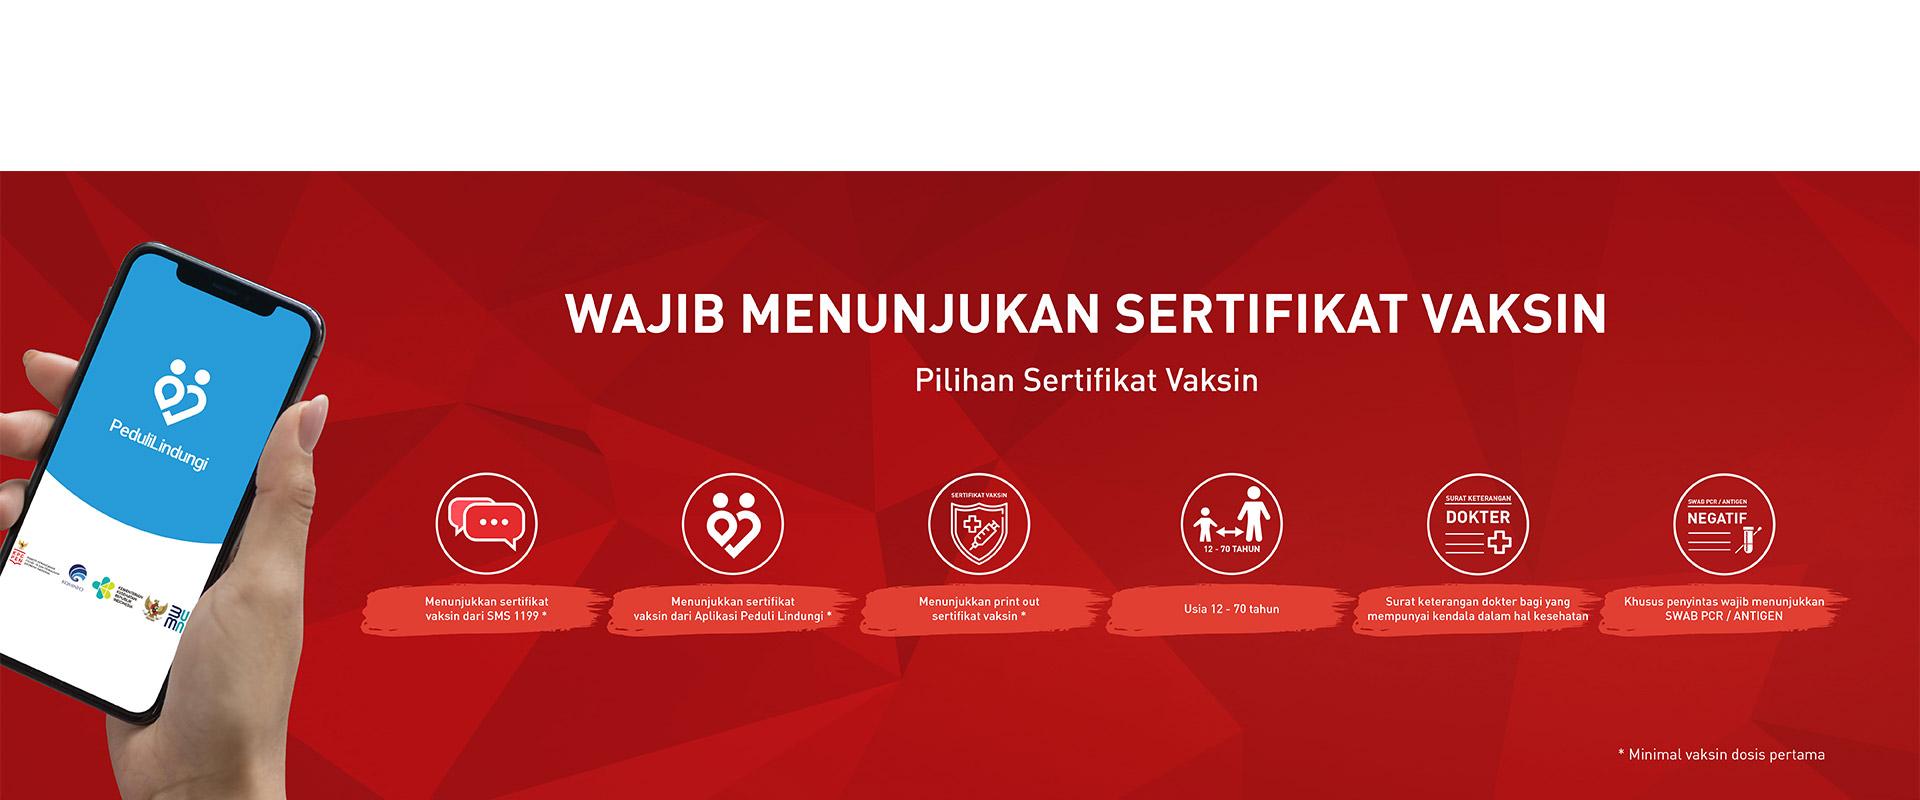 slider-Pilihan-Sertifikat-Vaksin-WEBSITE-01-update